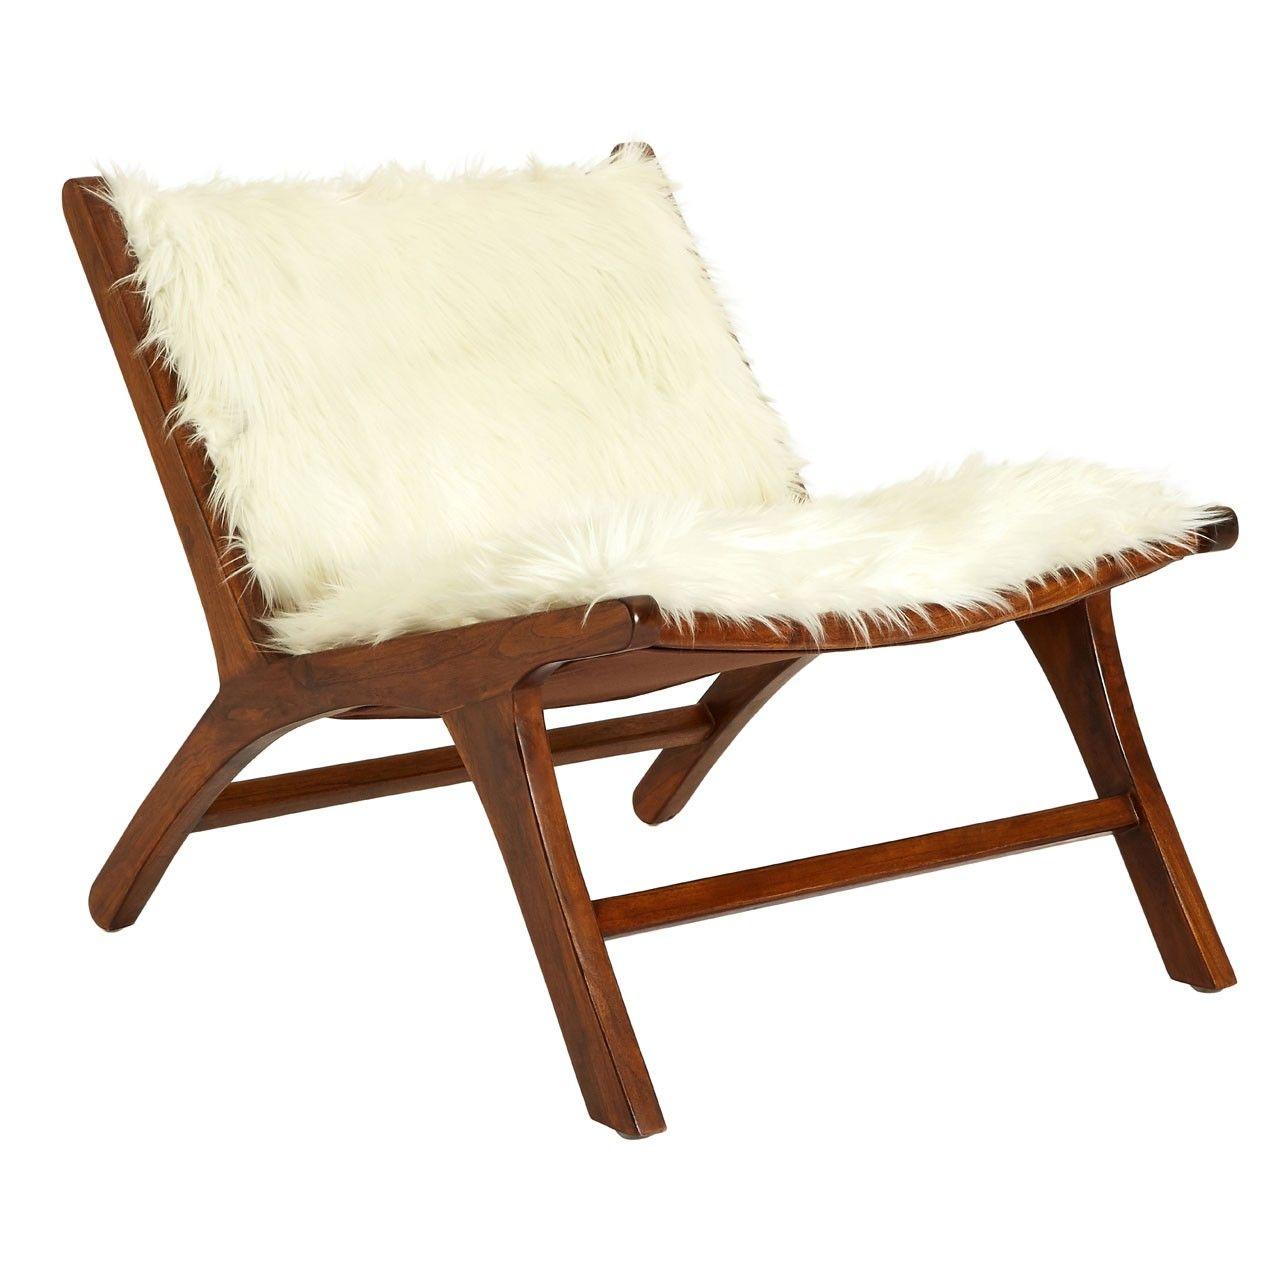 Retro Style Scandinavian Wood Furry White Chair